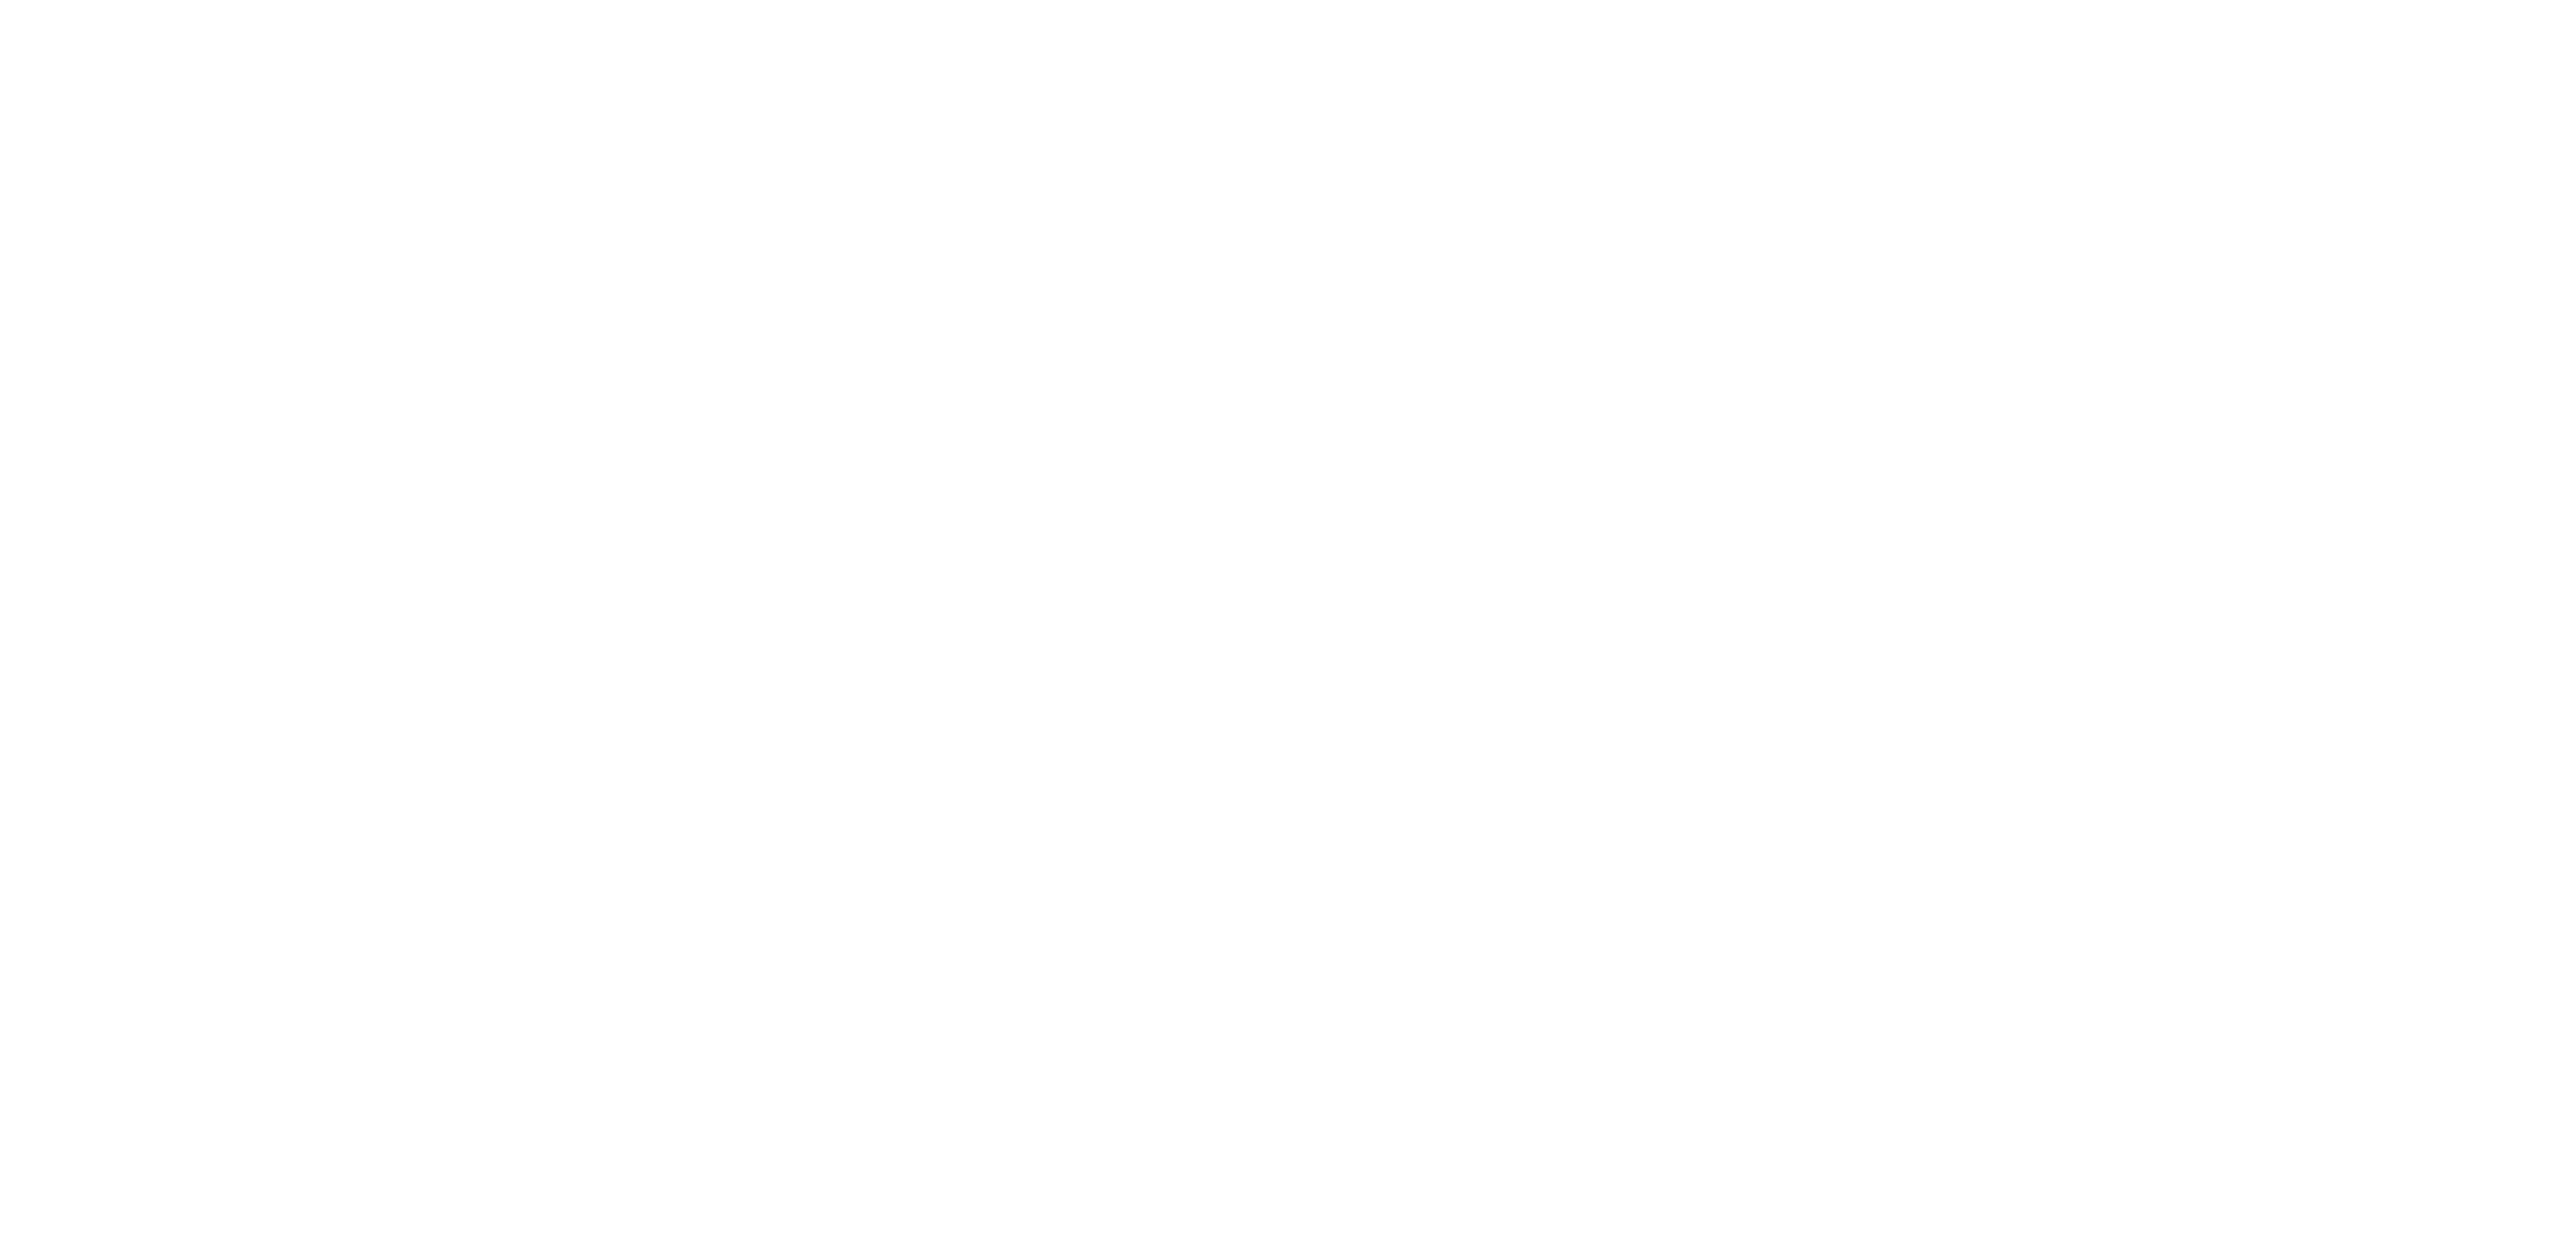 LOGO ACUPHARMA_Guld_et sundere alternativ_A-03